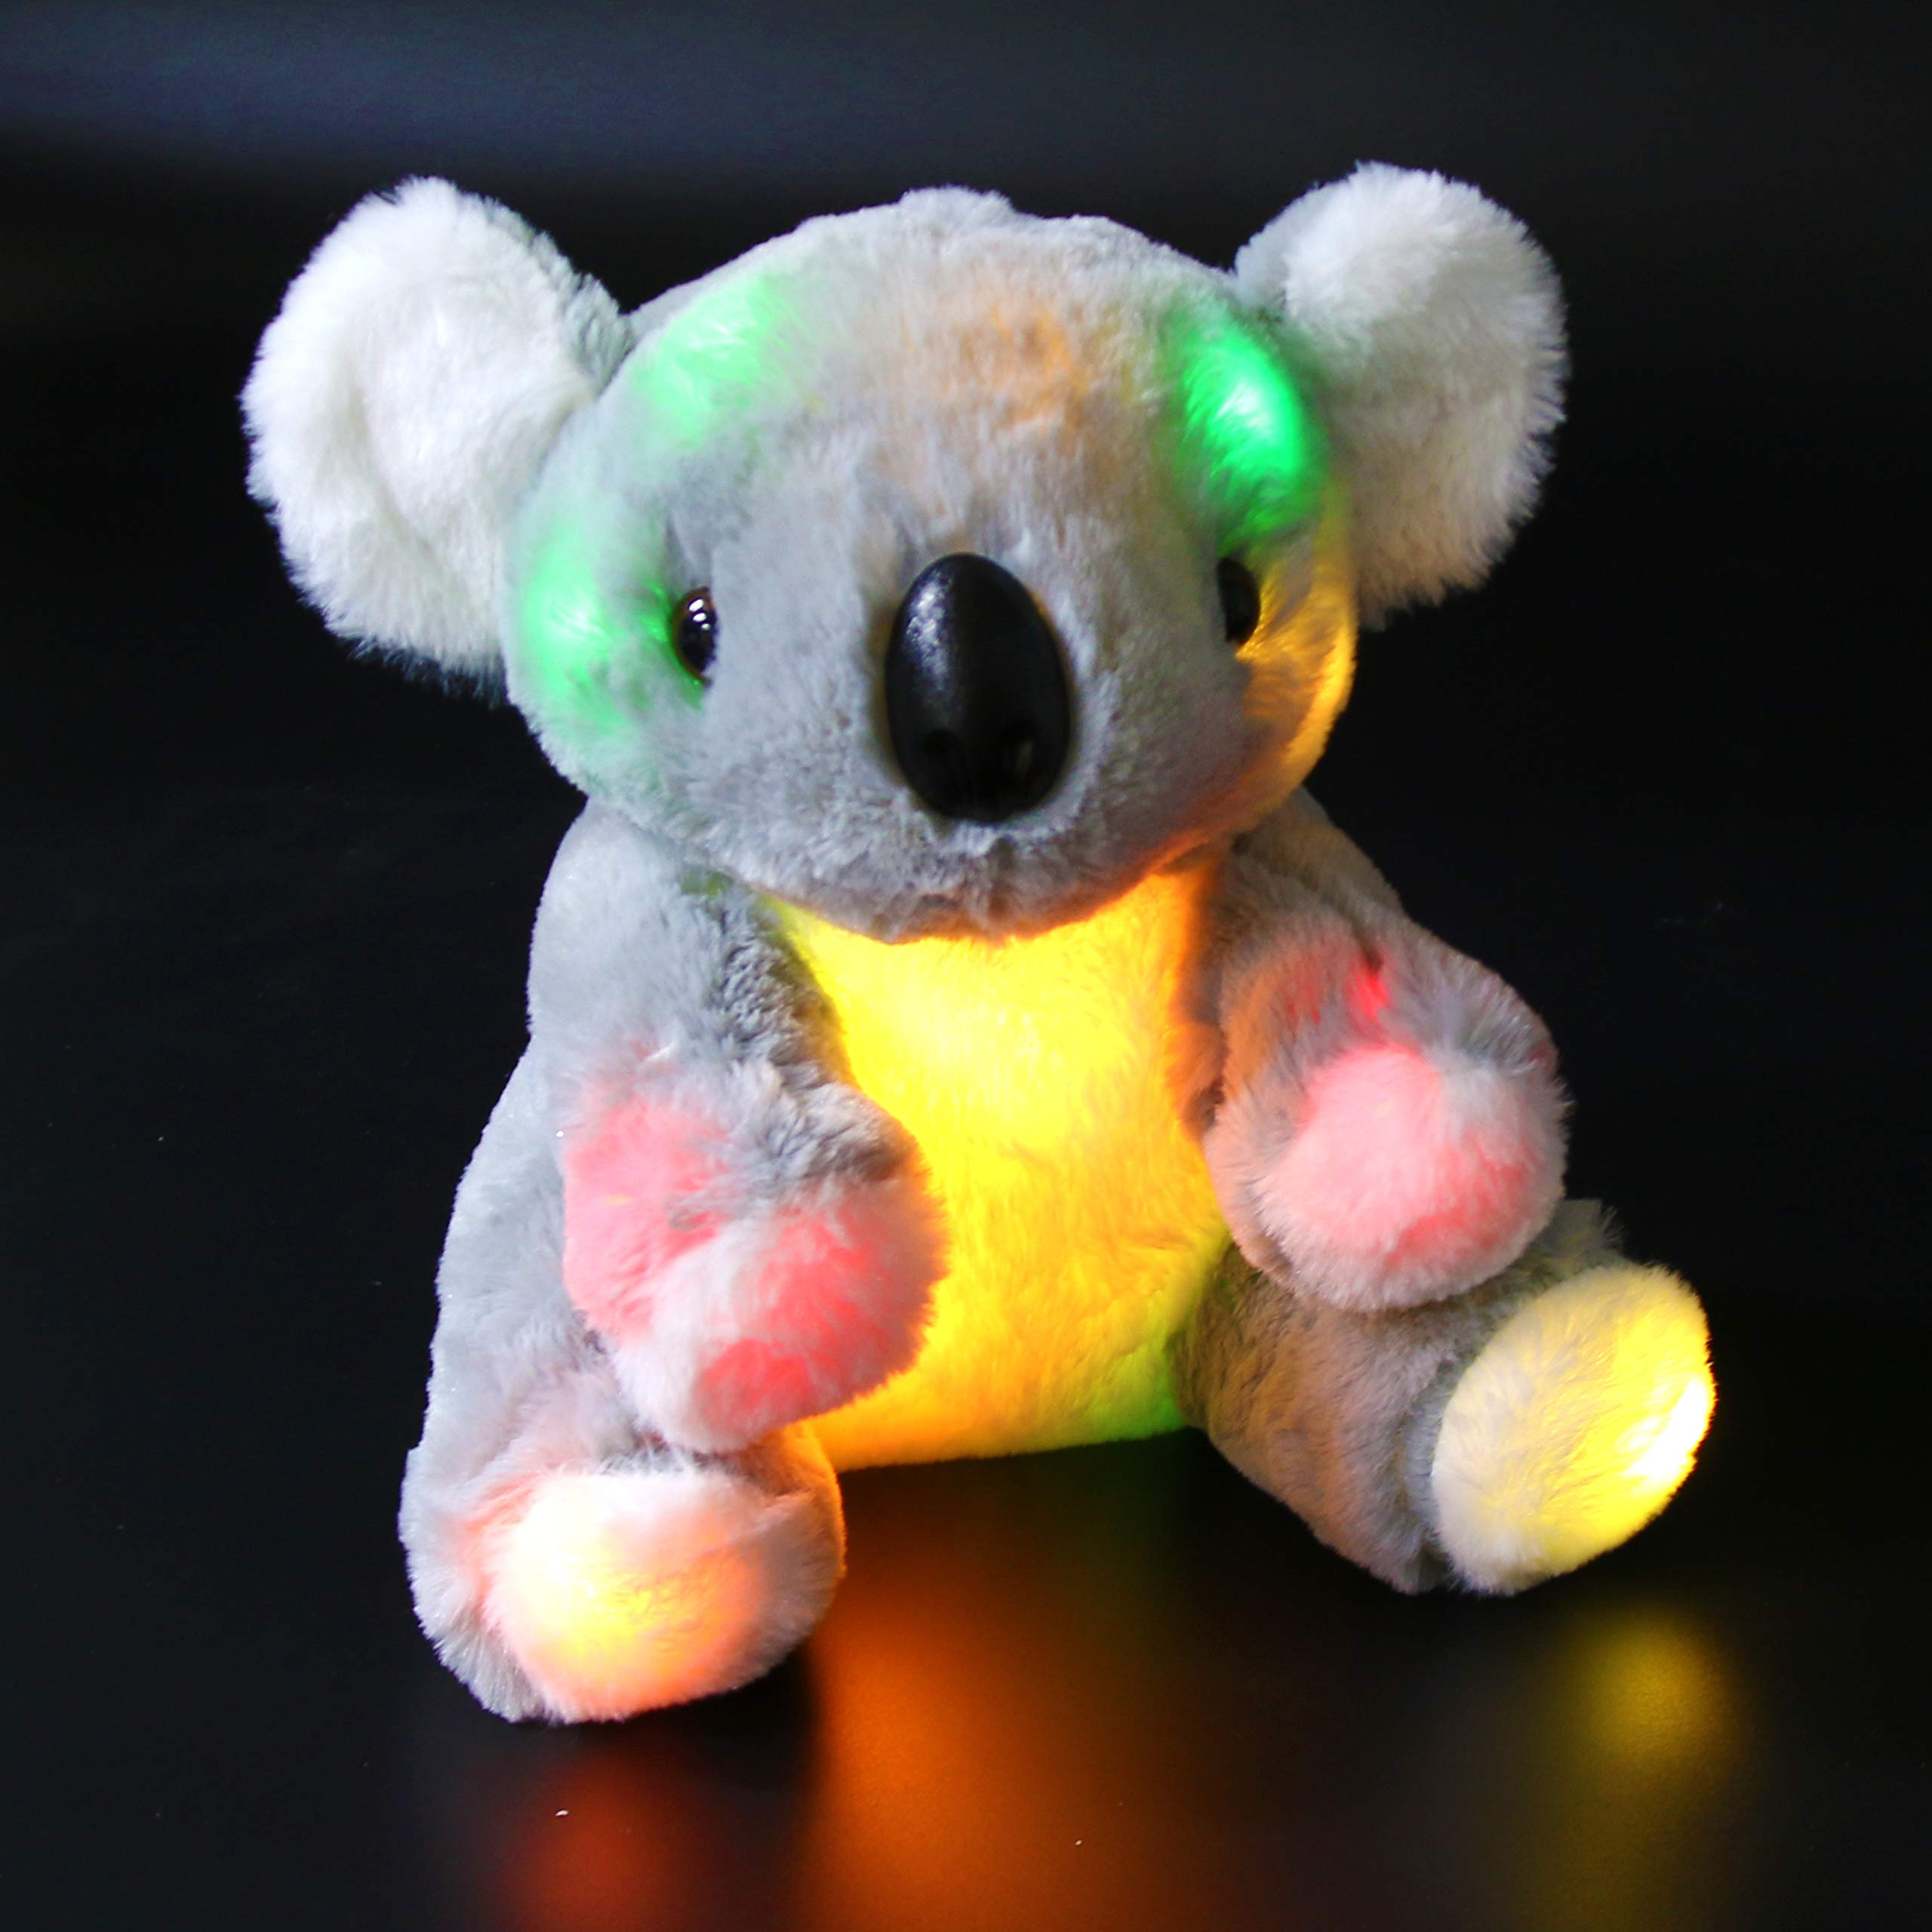 Bstaofy Light Up Gray Koala Bear Stuffed Animal LED Glow Soft Adorable Floppy Colorful Plush Toy Birthday for Kids Toddlers, 9.5''